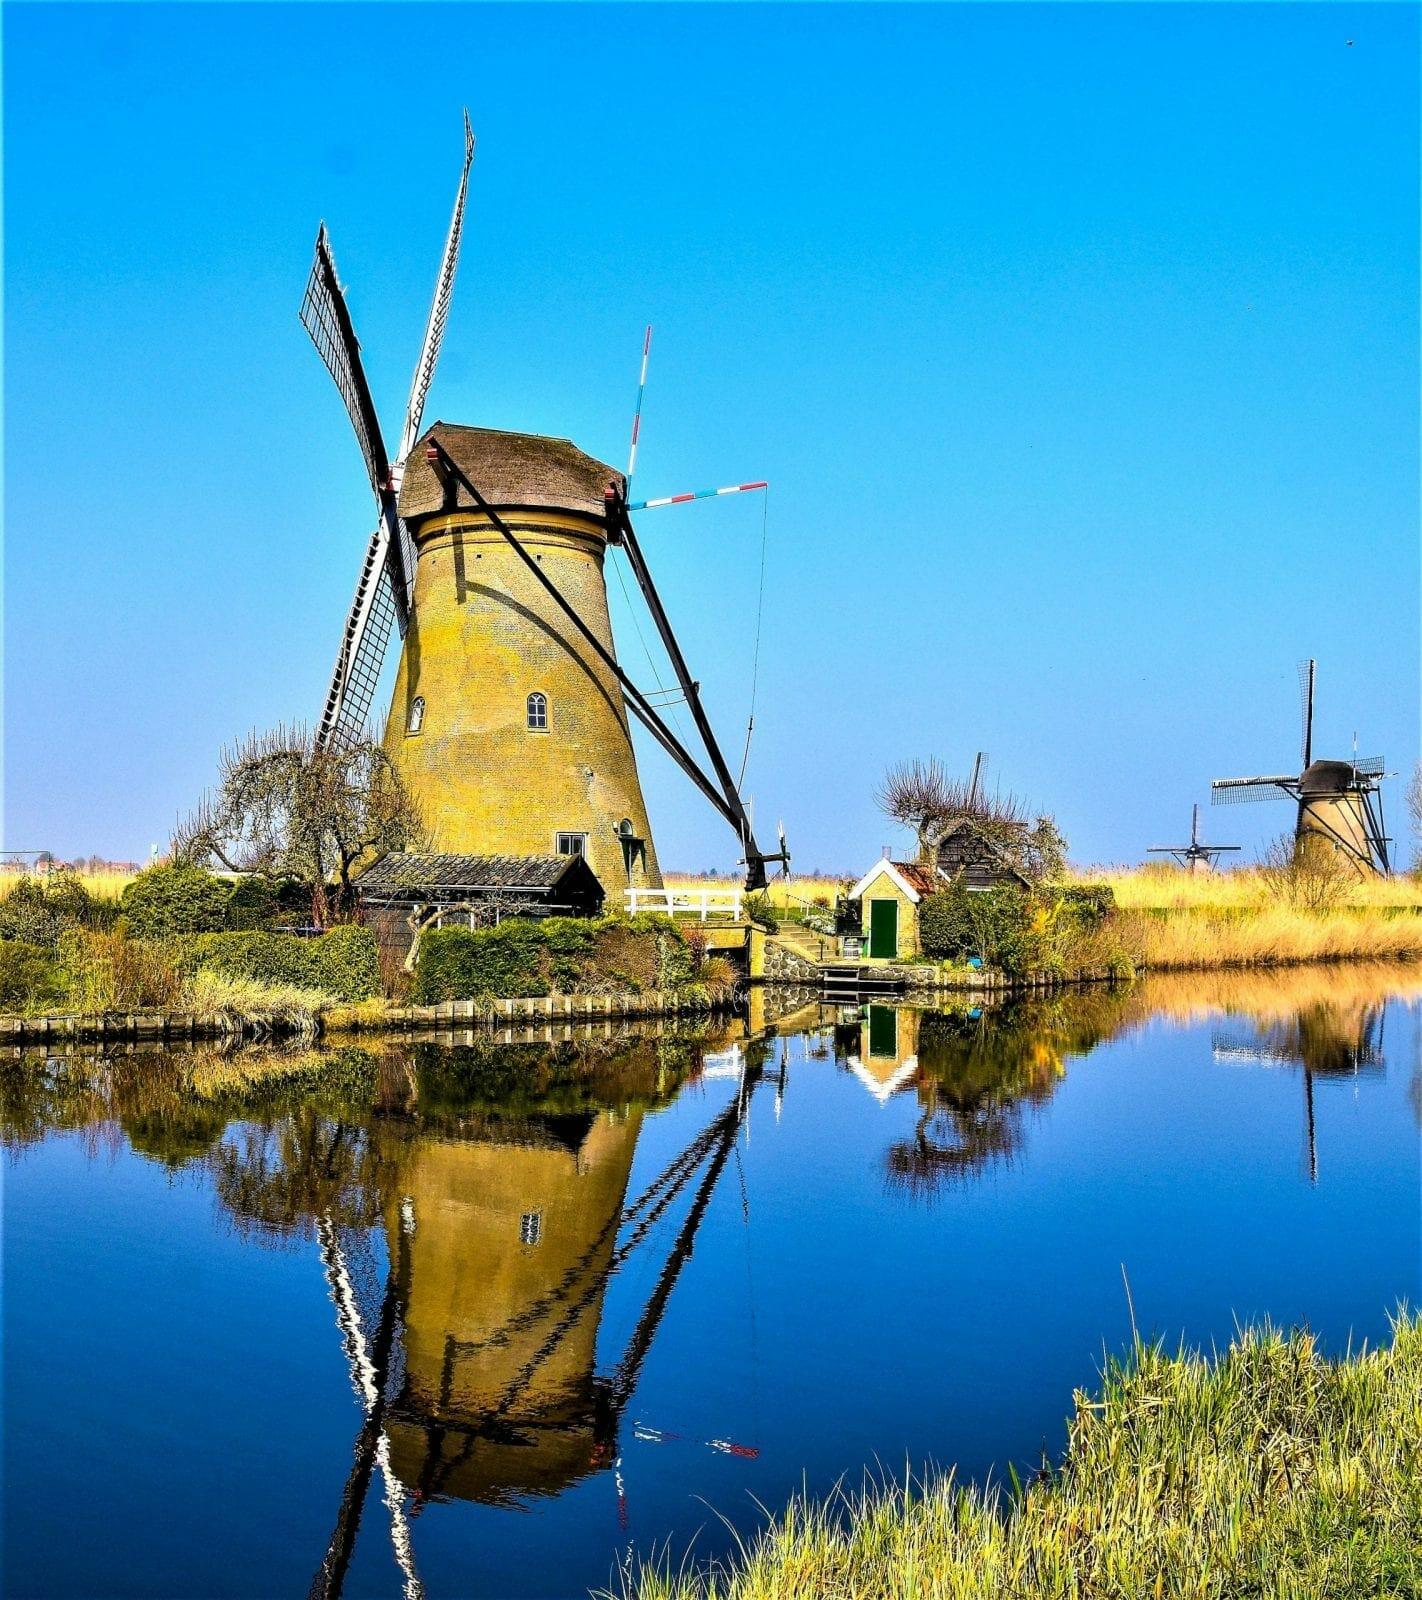 Netherland Windmills